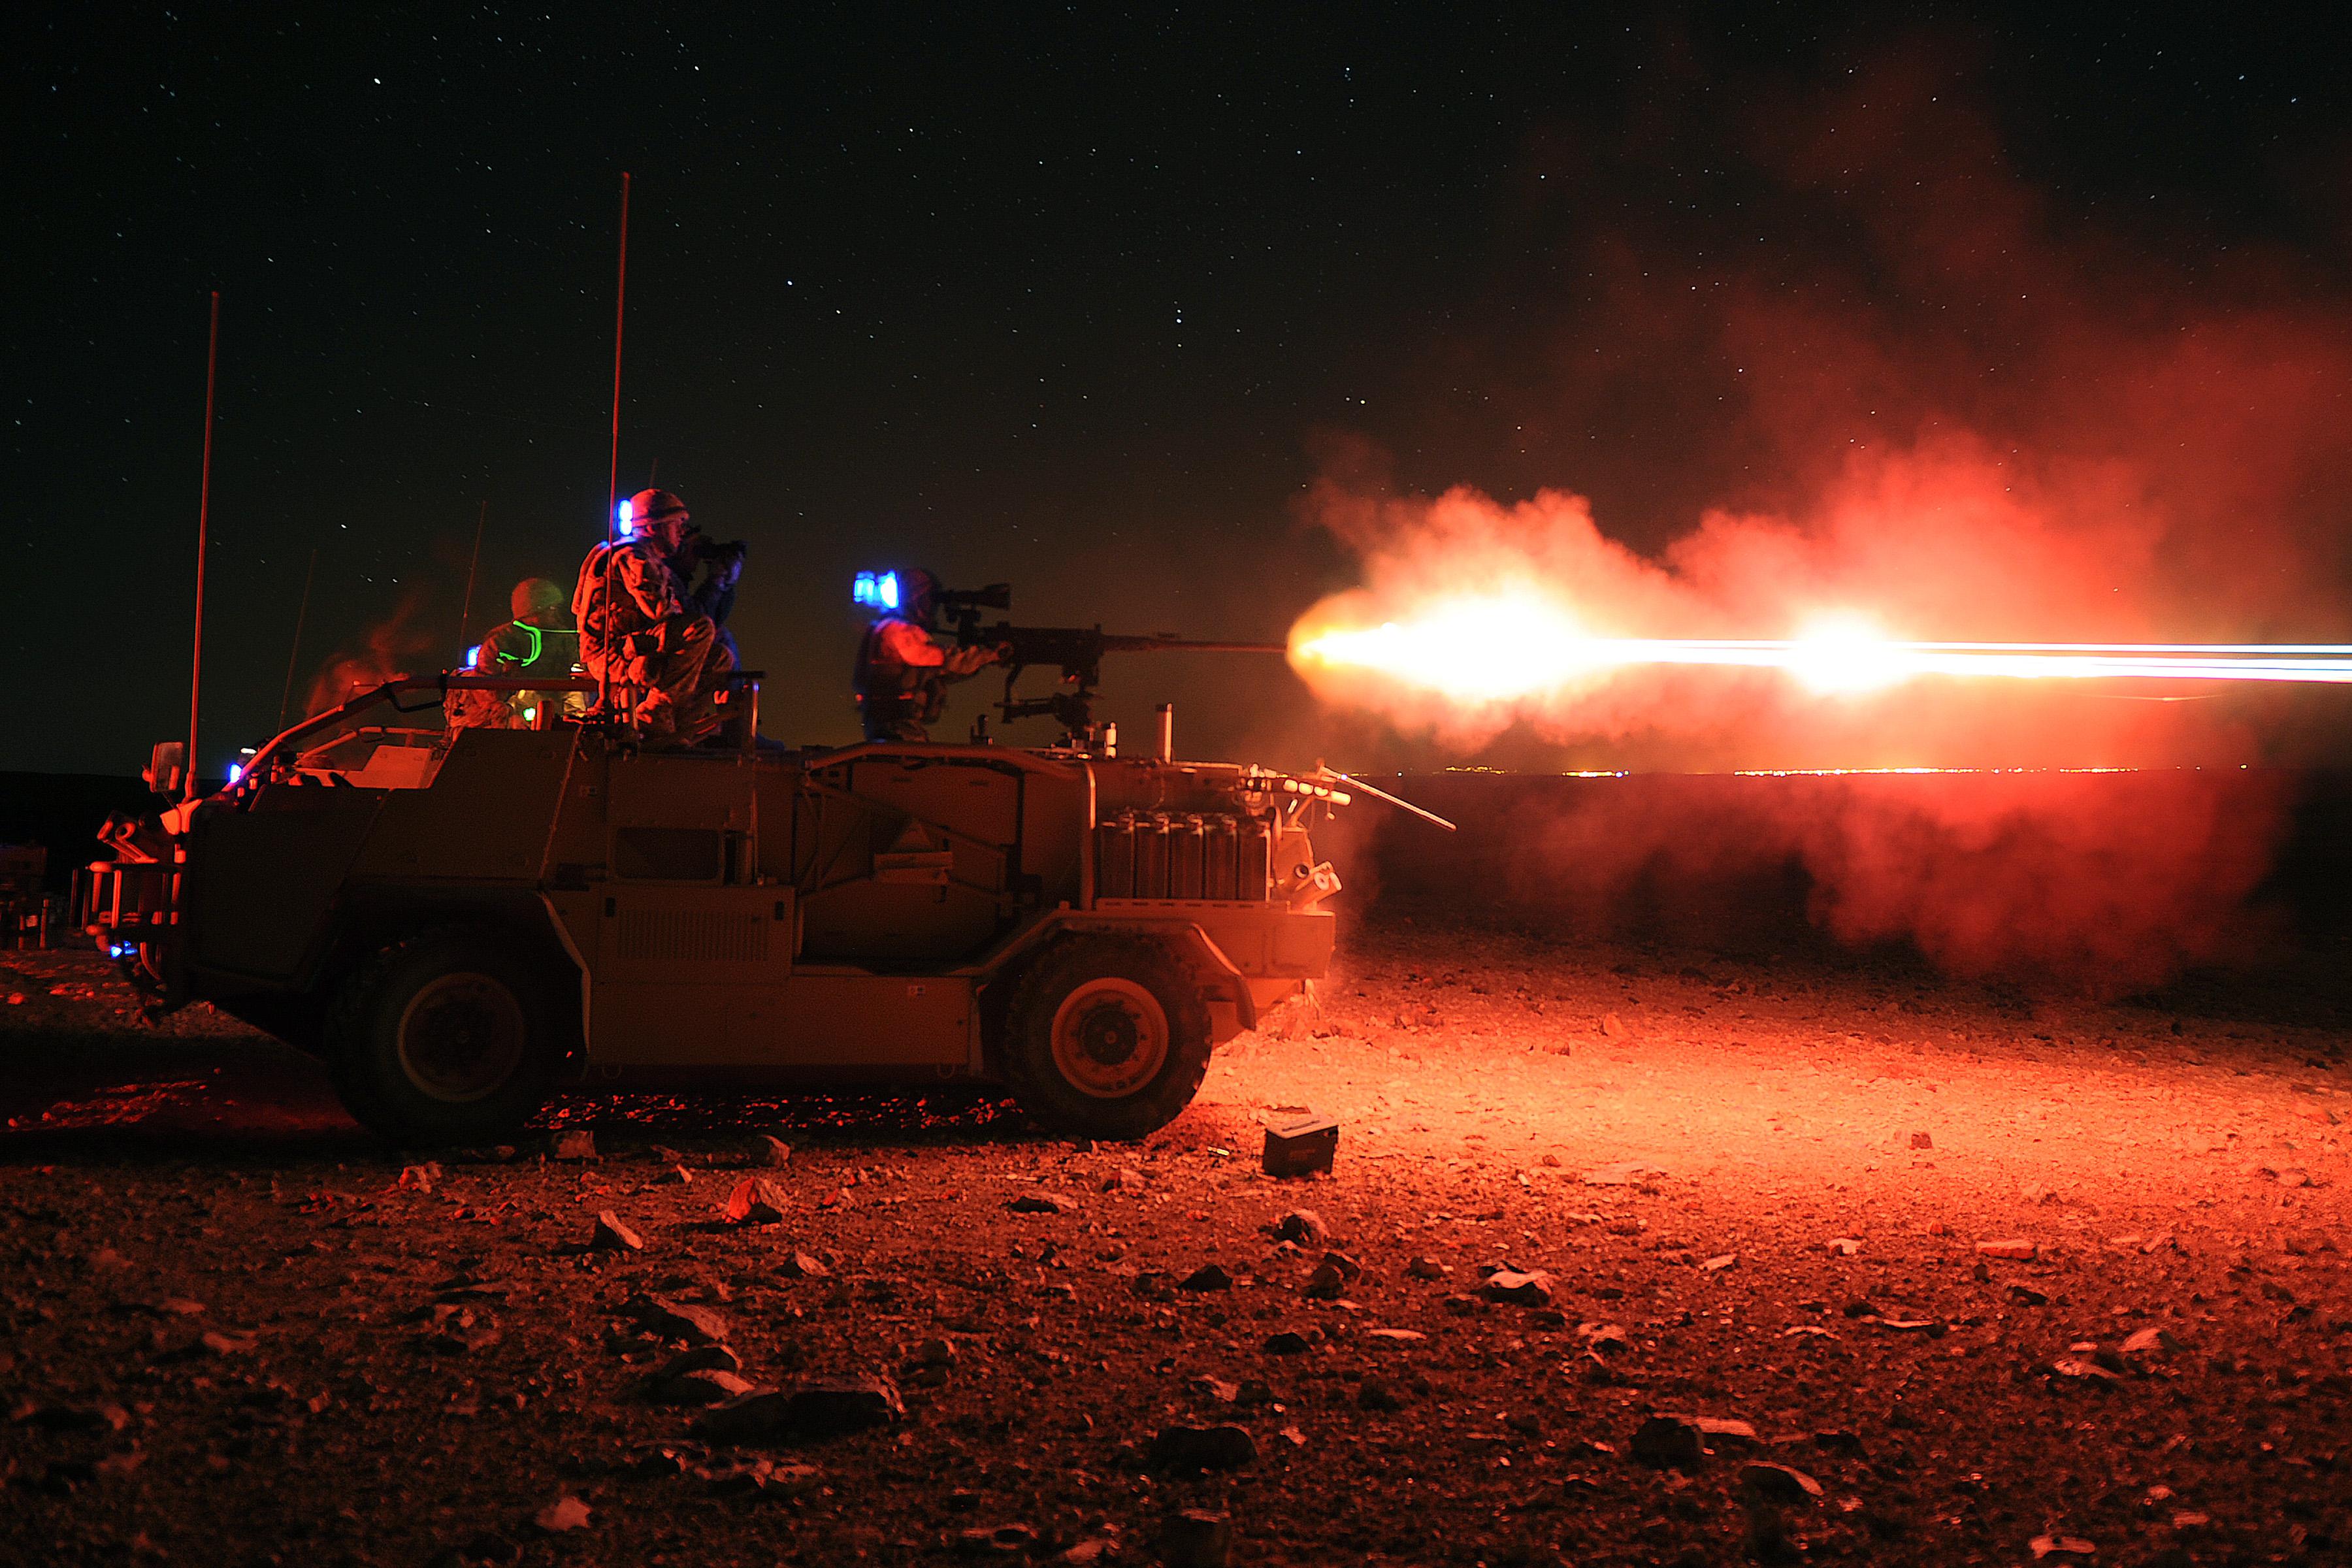 File:Soldiers Night Firing .50 Cal Weapon in Jordan MOD ...